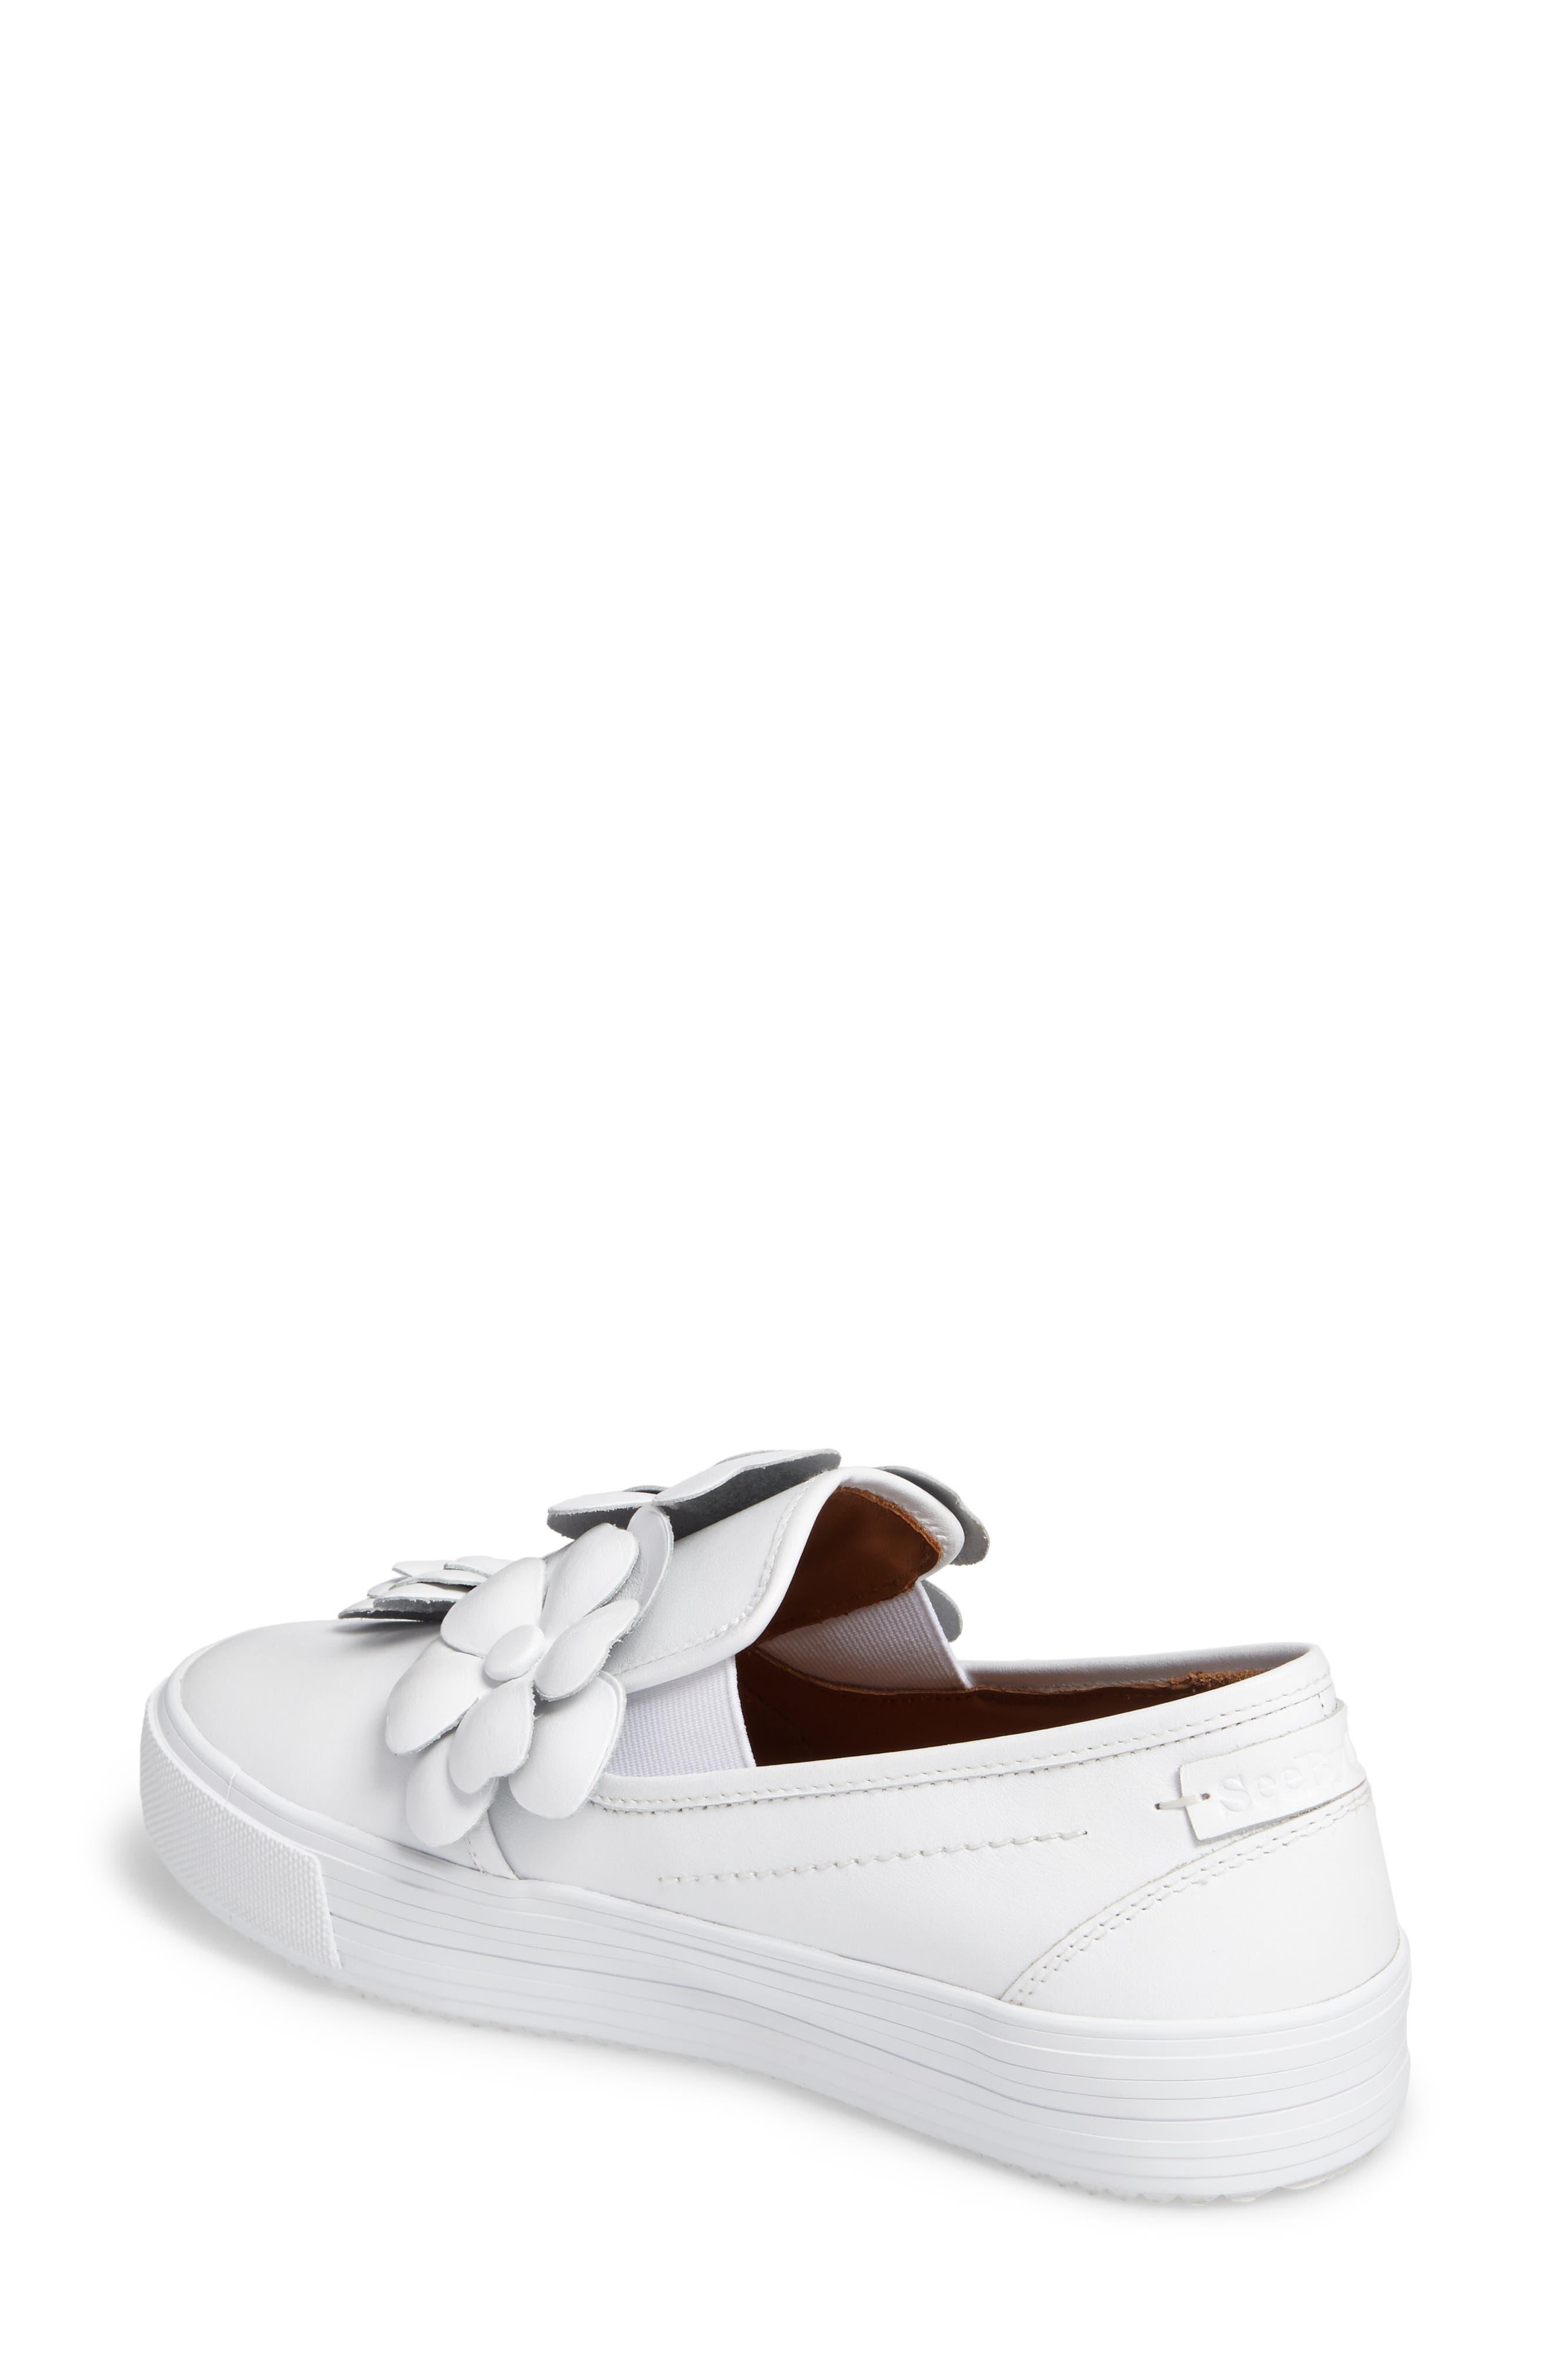 Vera Floral Appliqué Slip-On Sneaker,                             Alternate thumbnail 2, color,                             WHITE